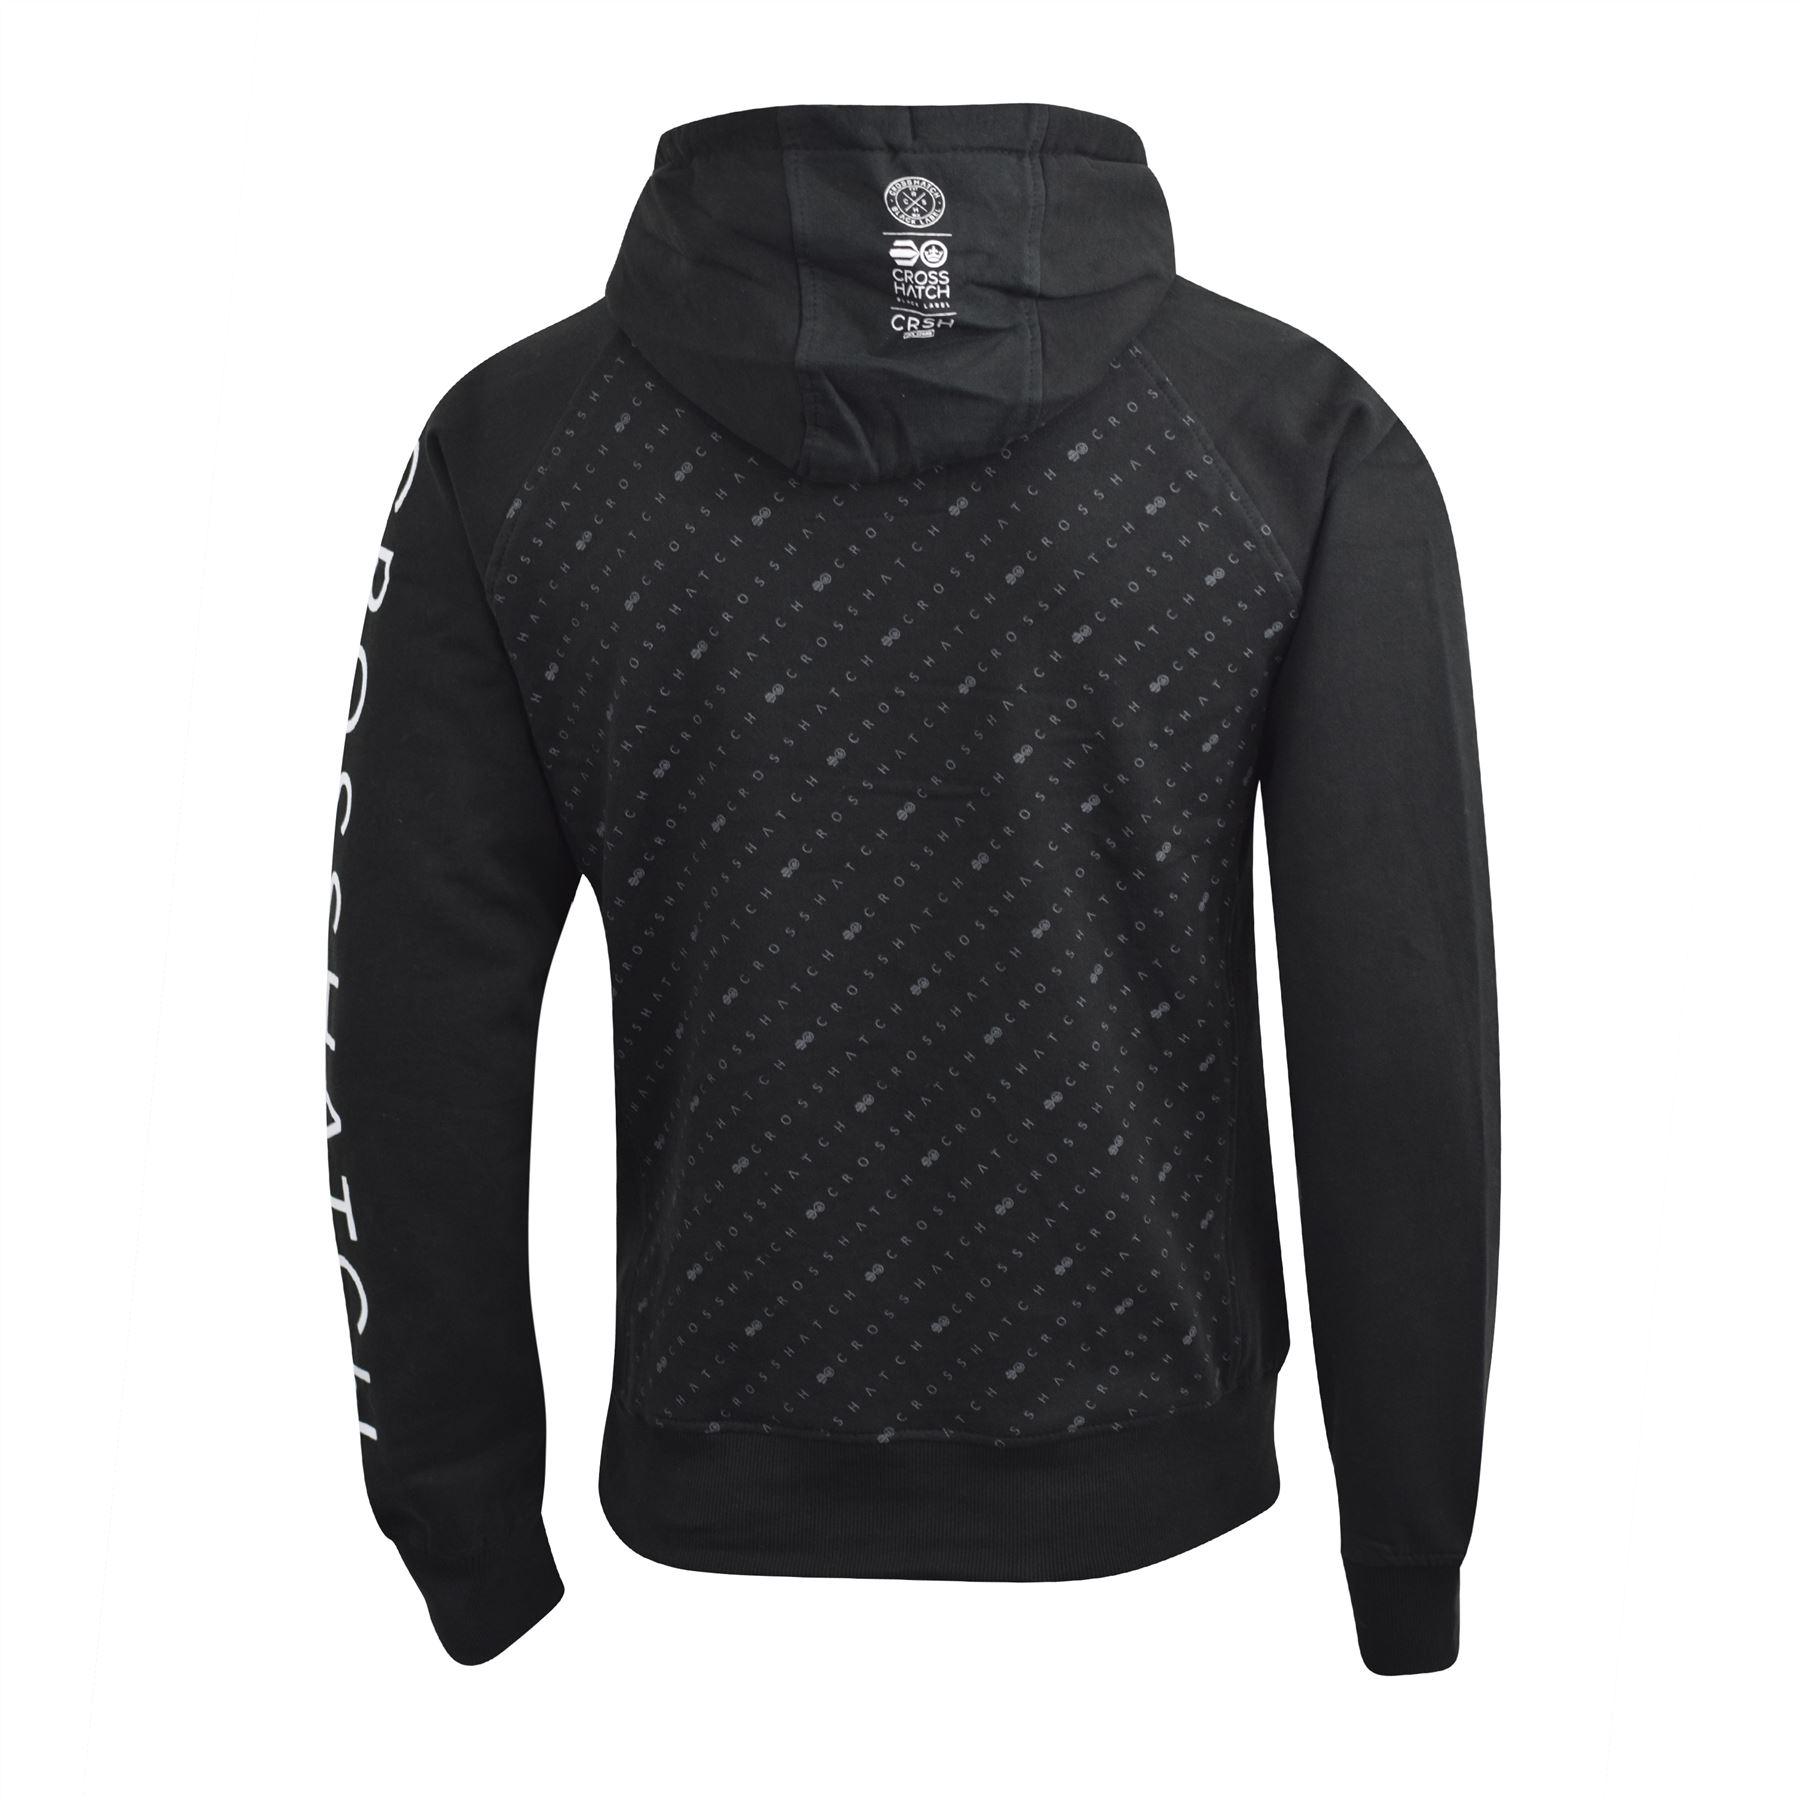 Mens-Hoodie-Crosshatch-Pullover-Degas-Hooded-Sweater-Jumper thumbnail 6